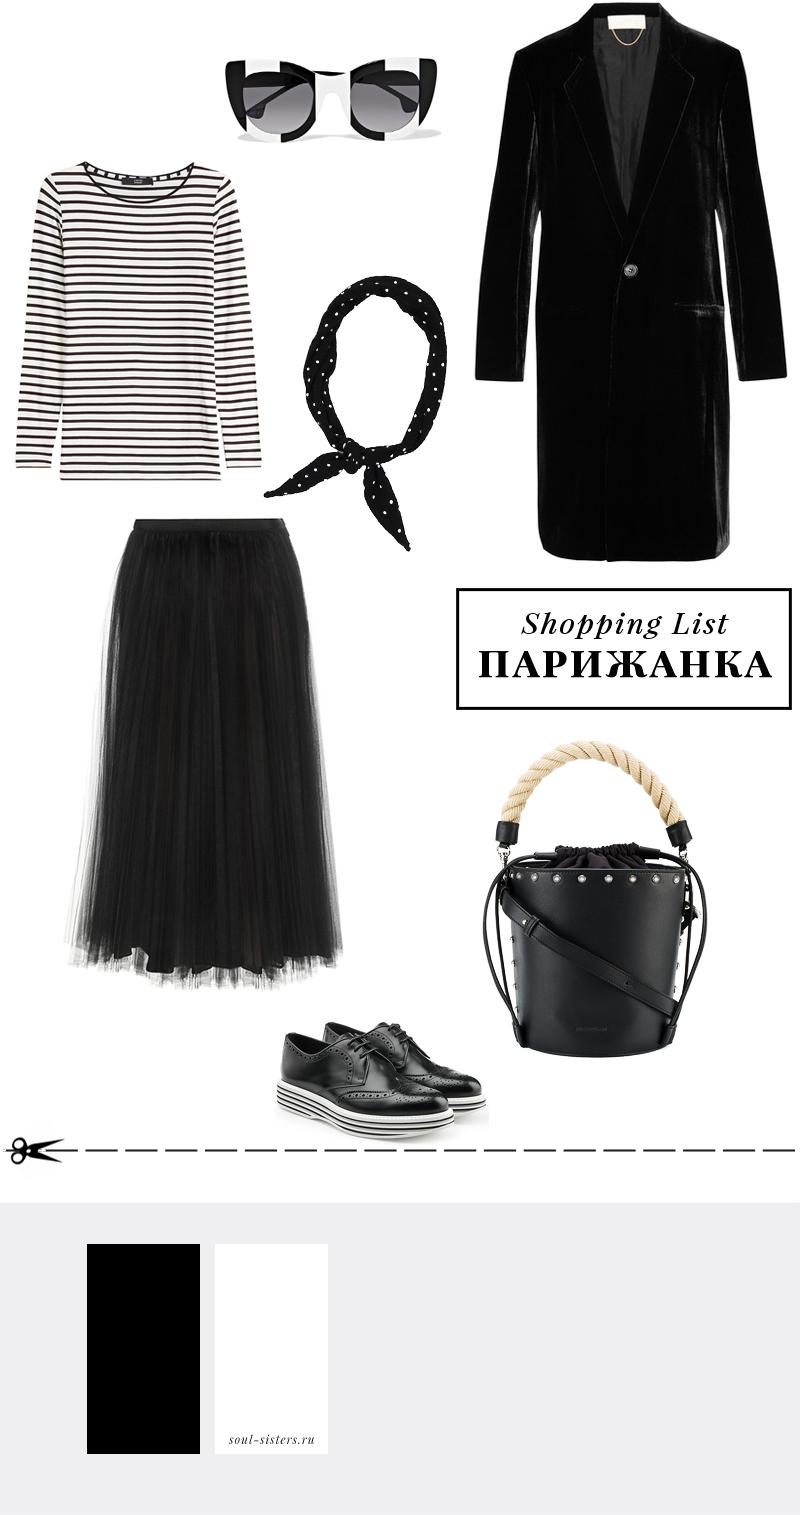 Shopping List__)))2